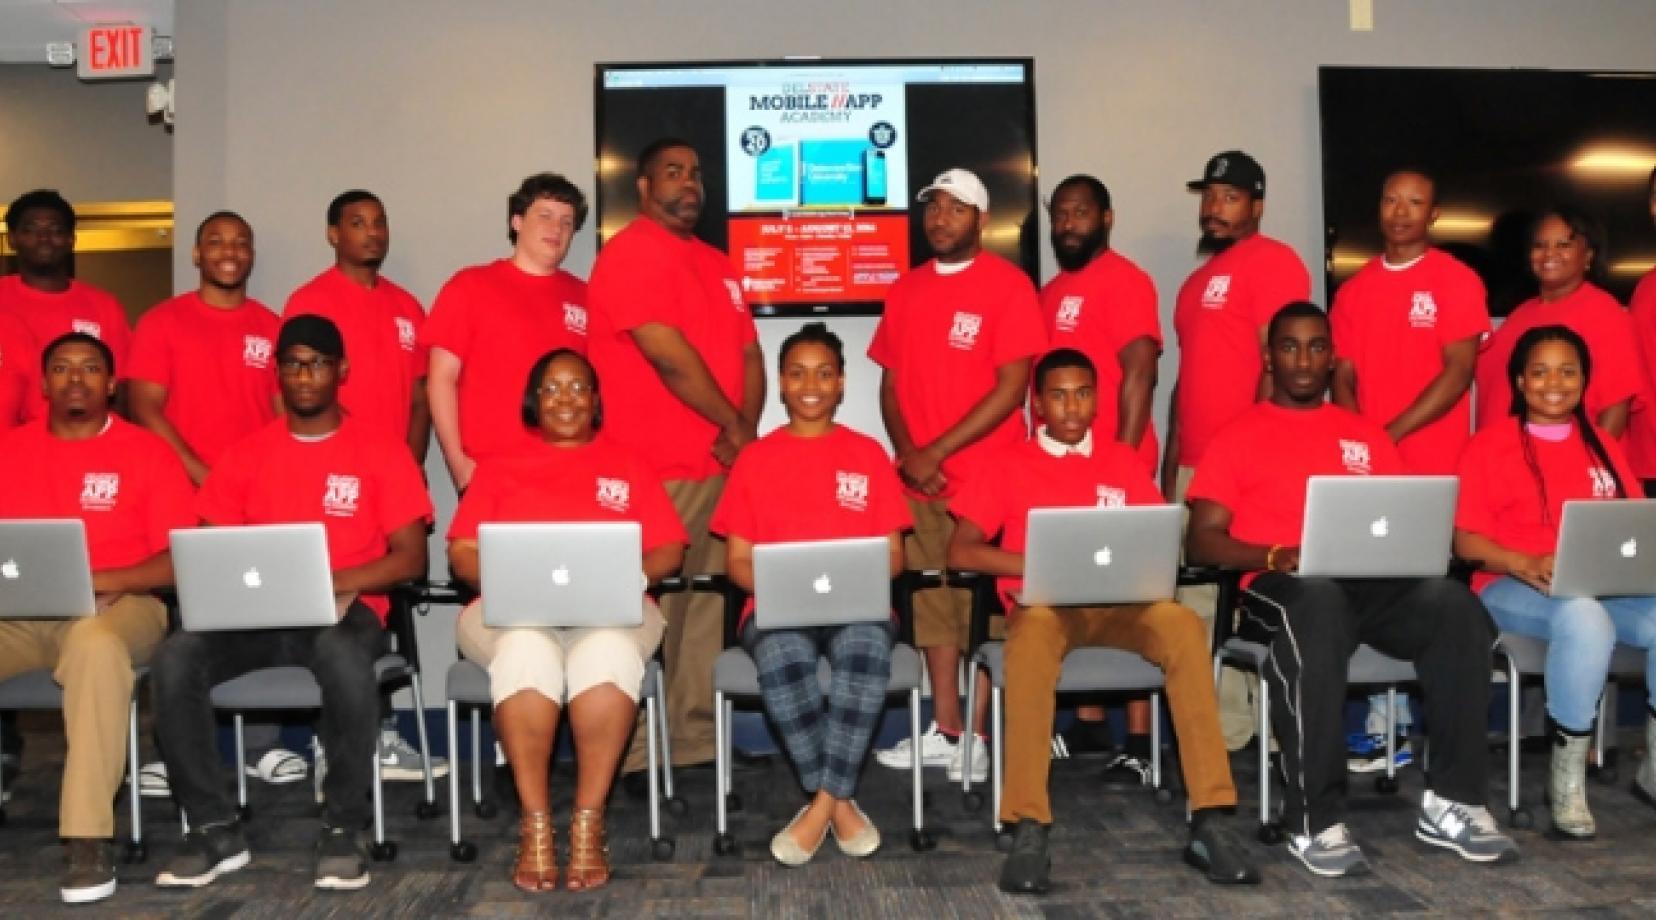 DSU, Mobile App training, Apple